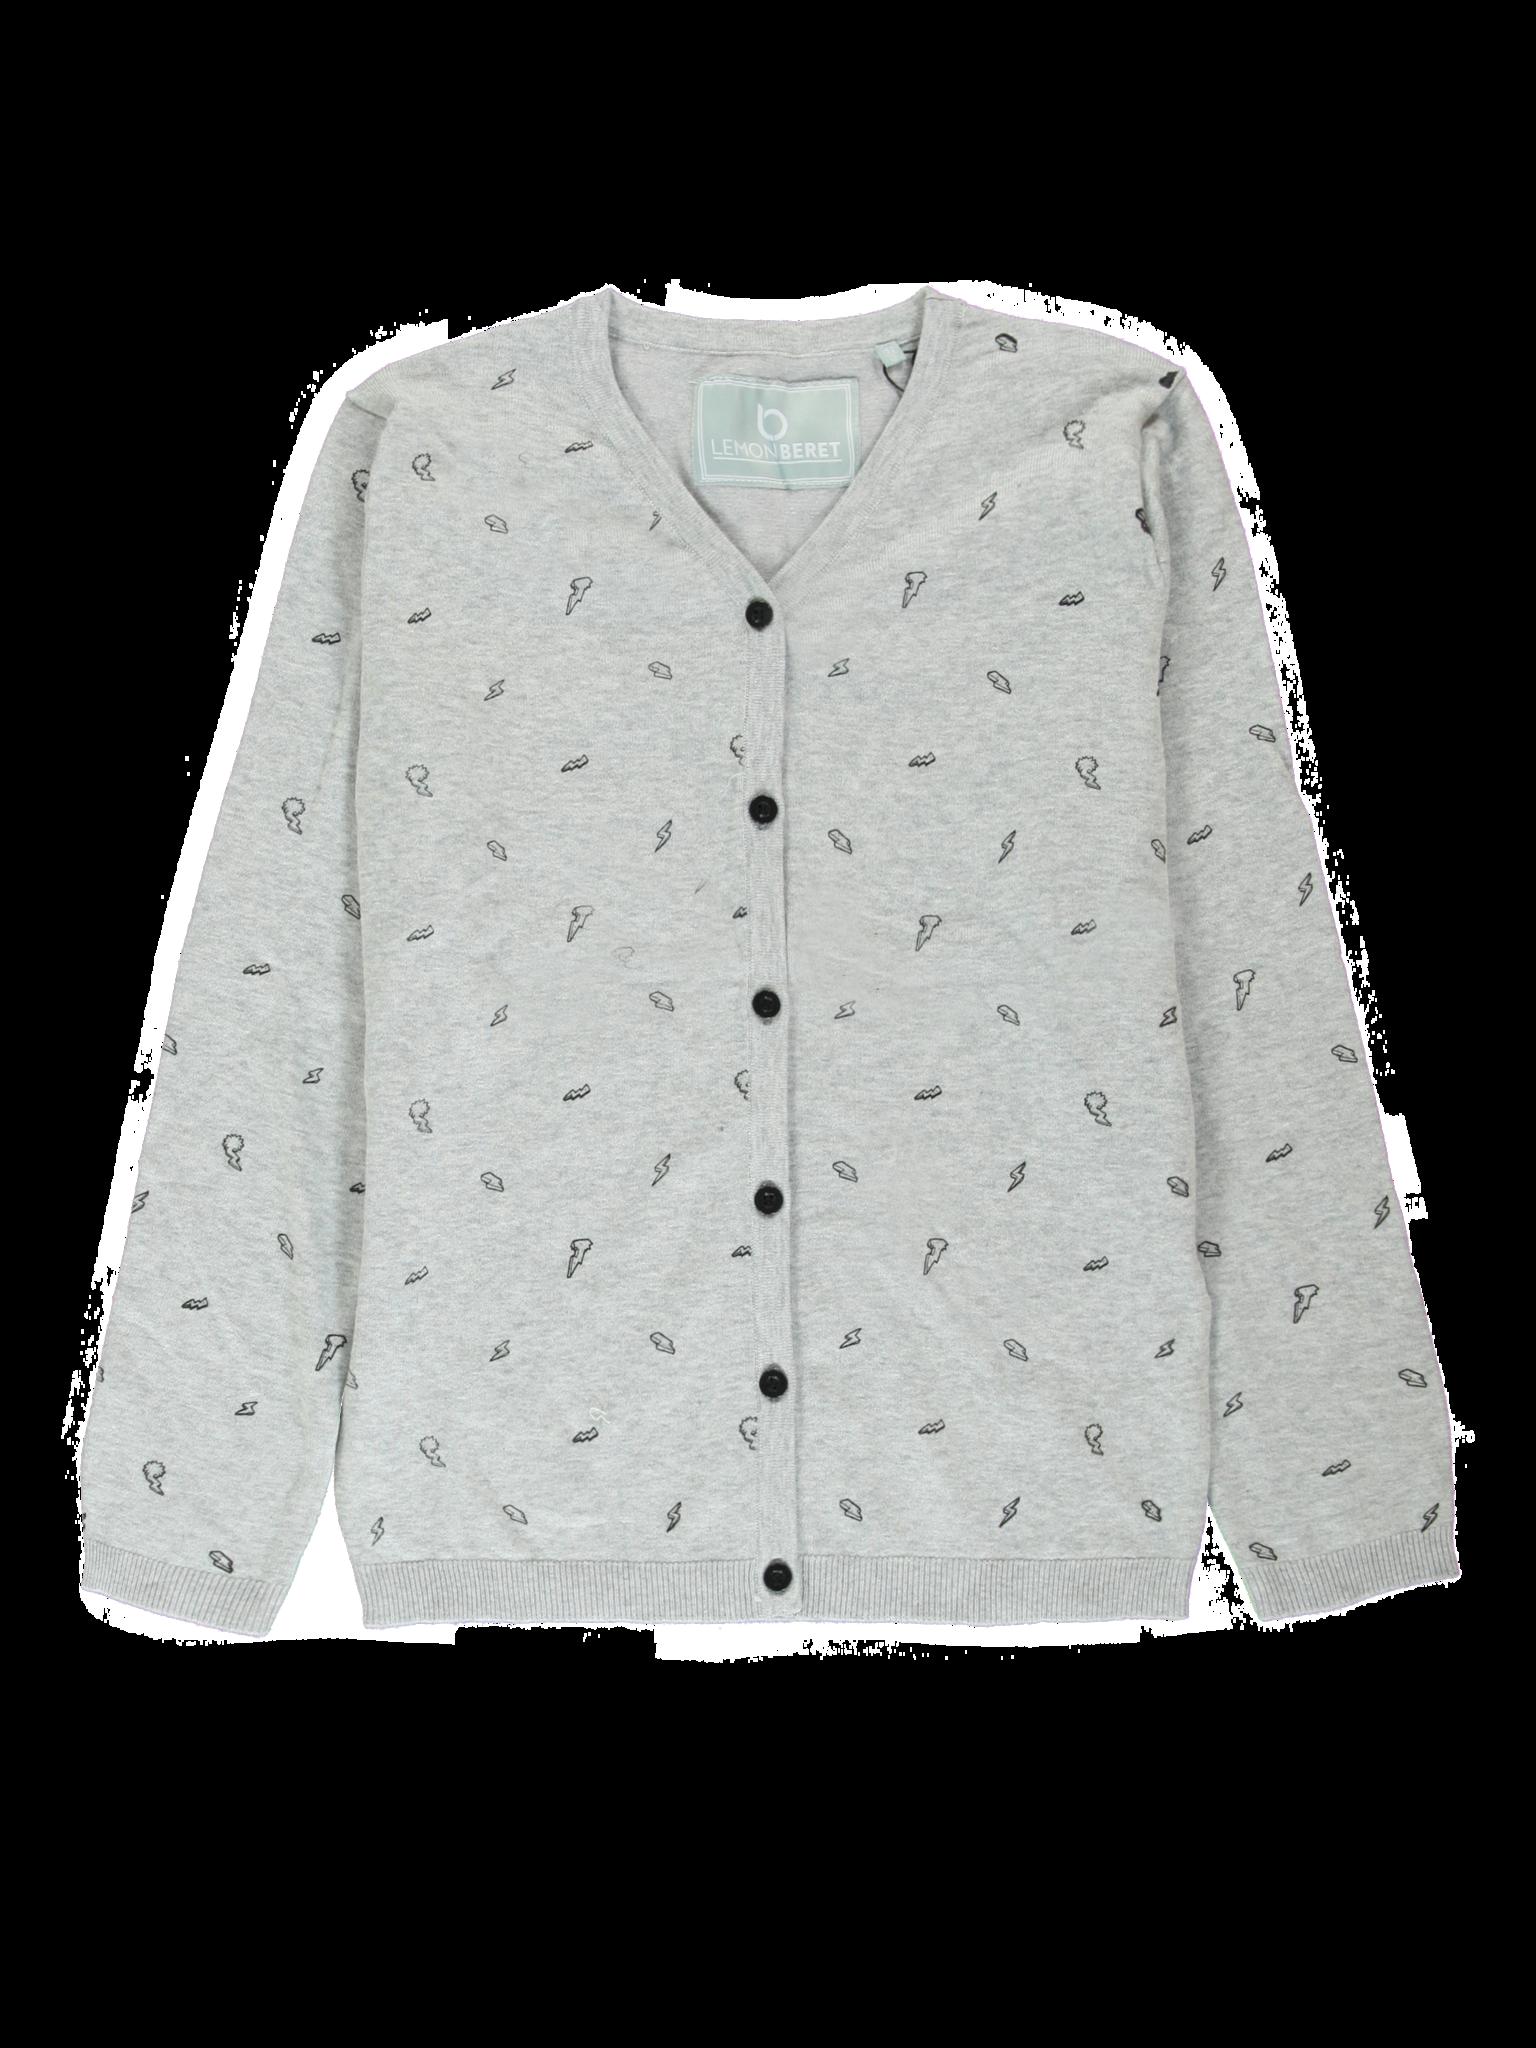 All Brands | Winterproducts Teen Boys | Cardigan Knitwear | 12 pcs/box